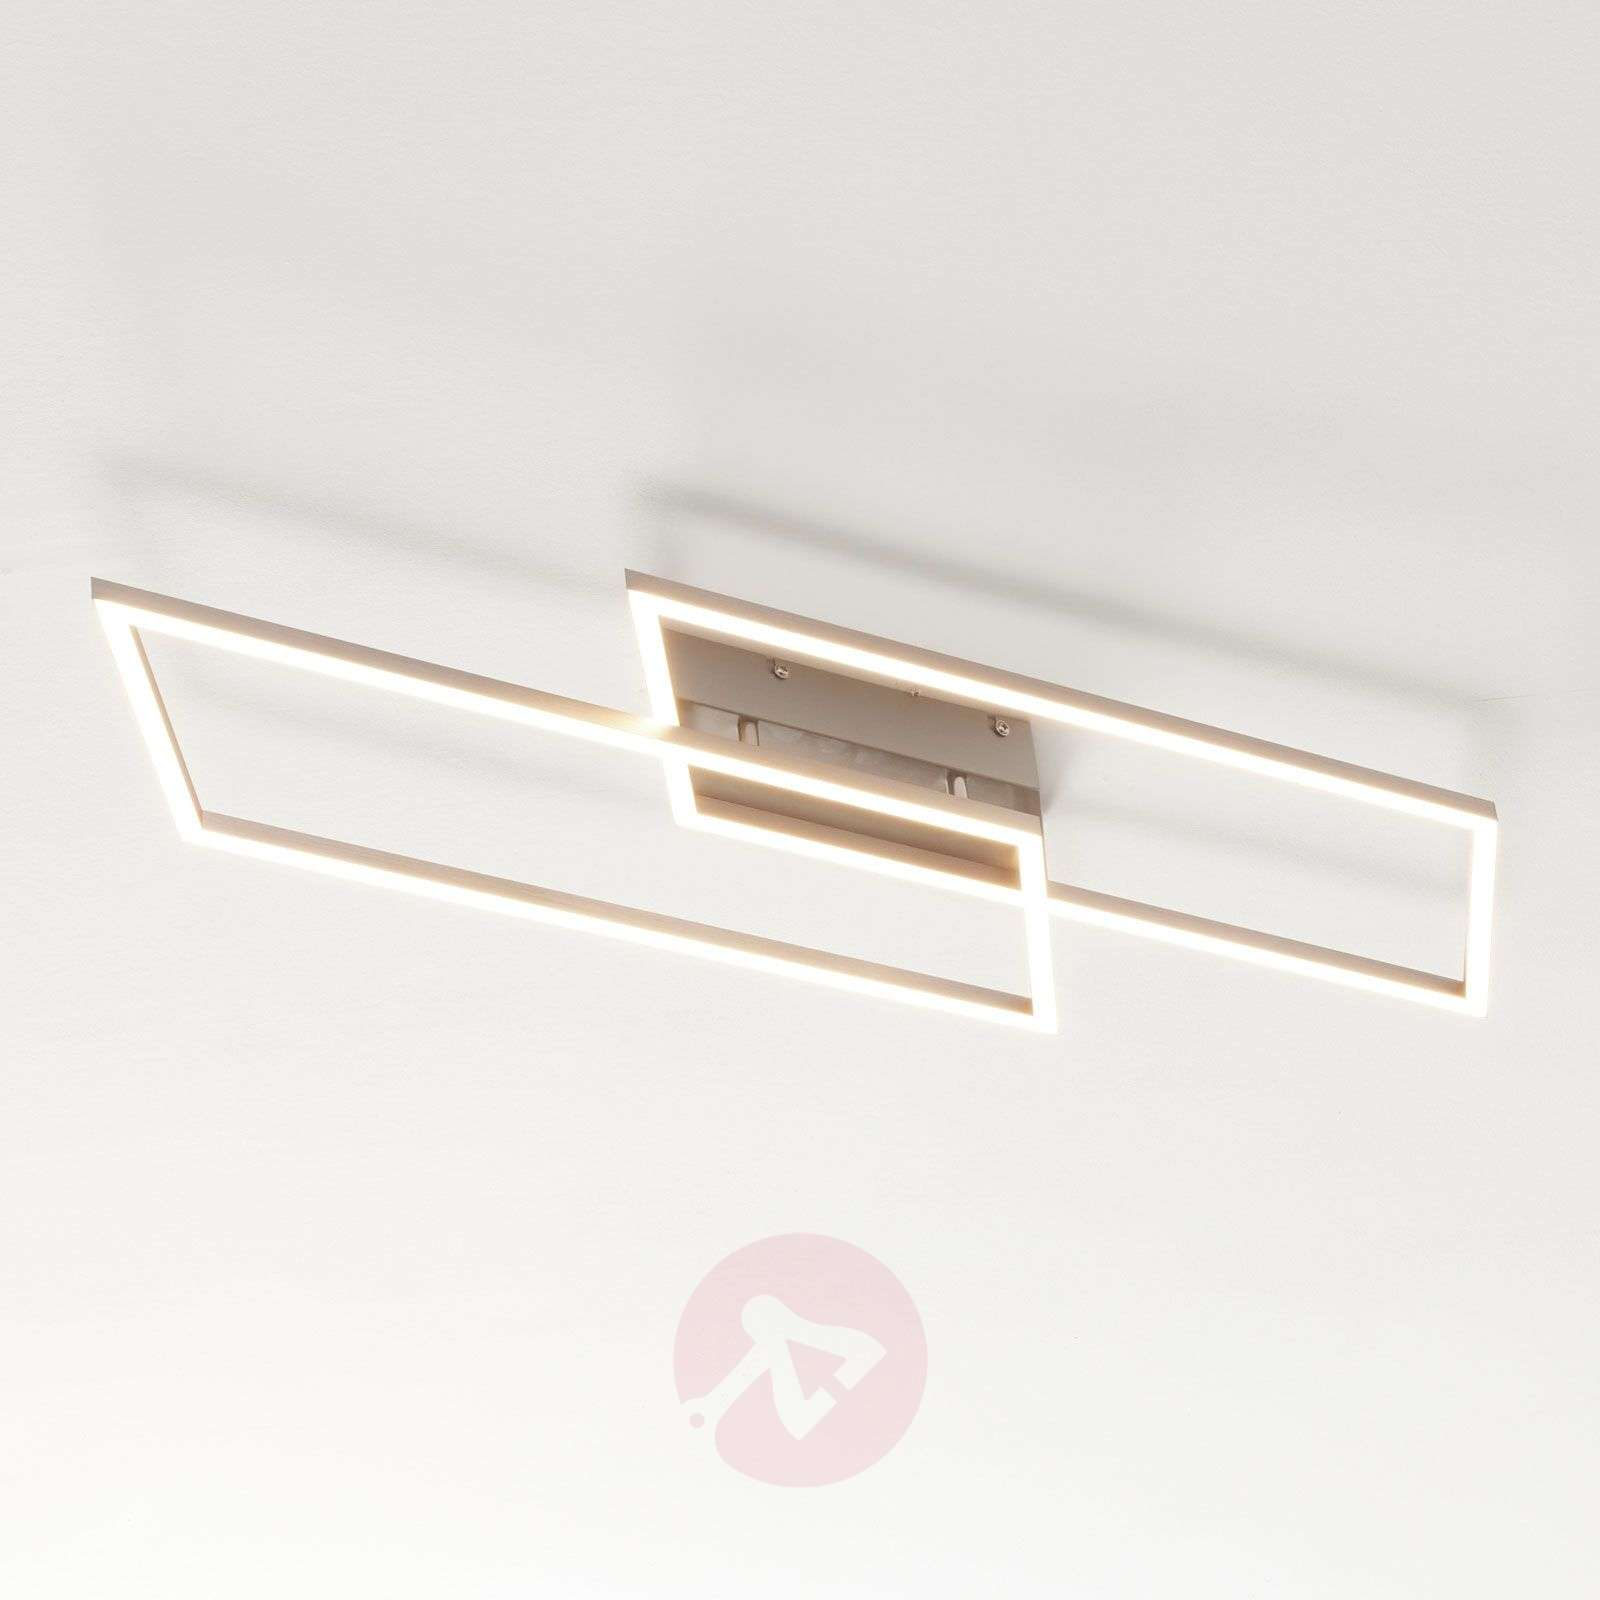 Rungonmuotoinen LED-kattolamppu Quadra, himmennet.-7620079-02